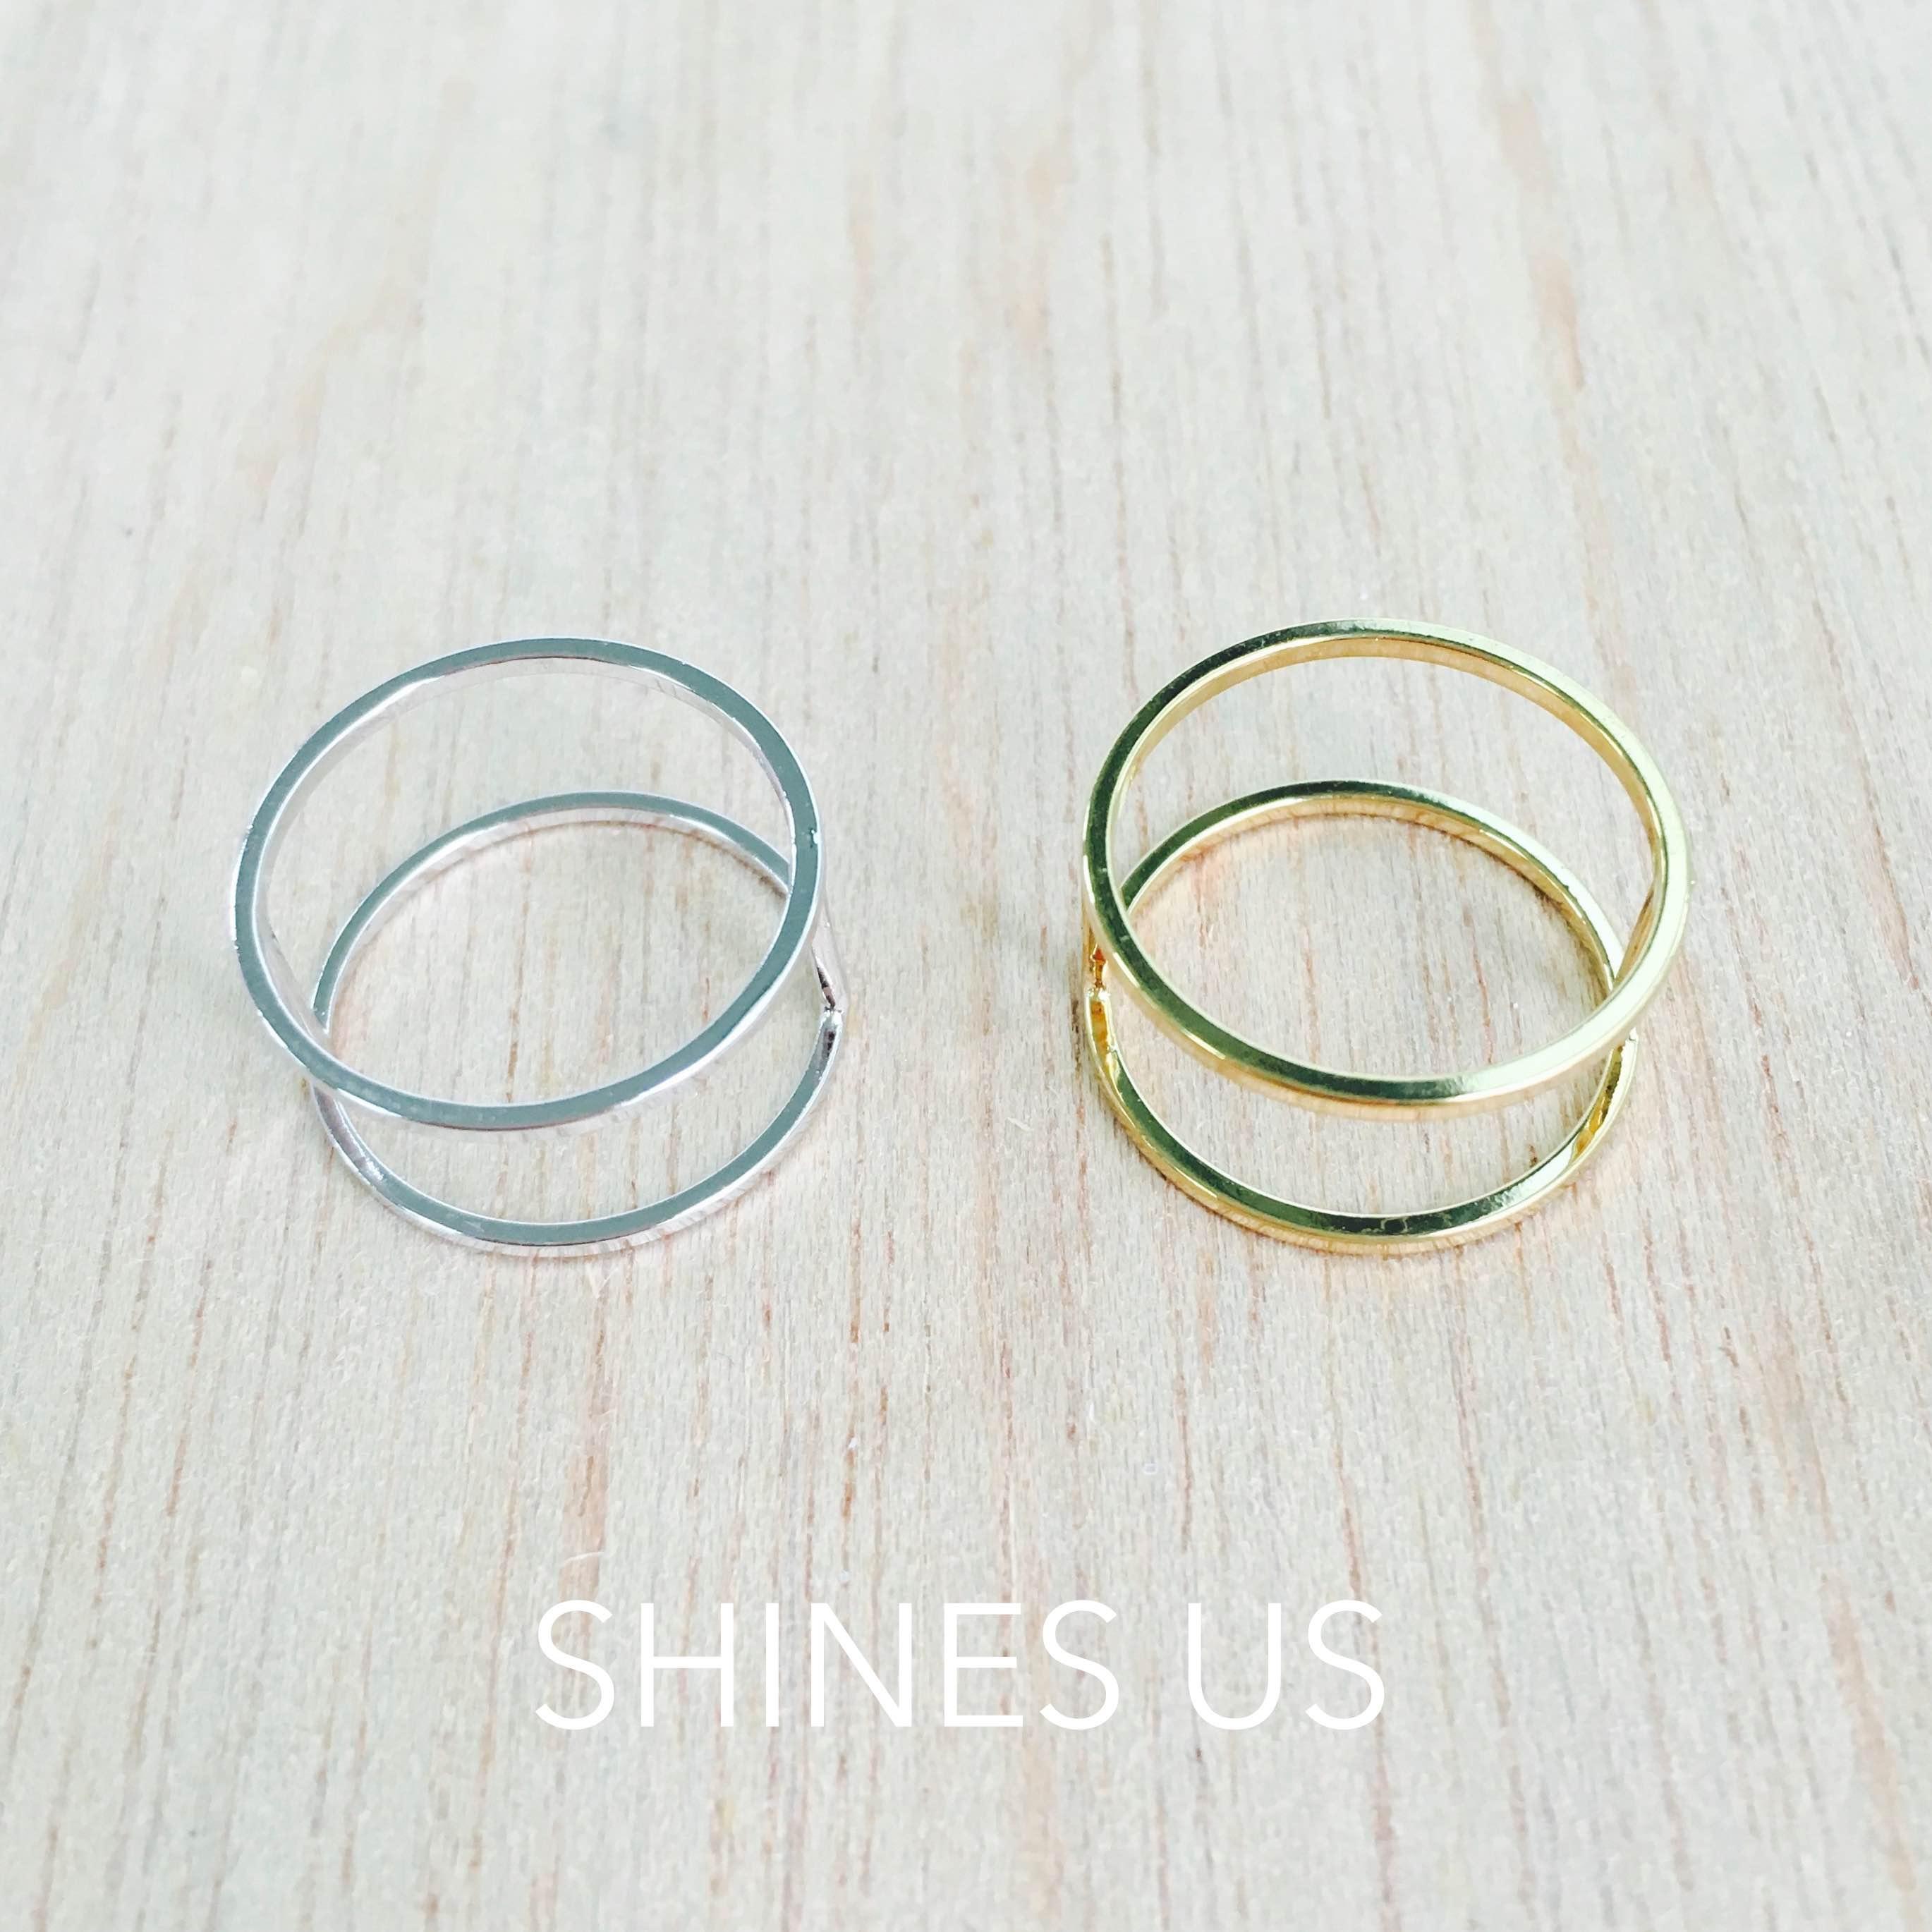 【SHINES US】正韓 簡約雙環戒指 戒指